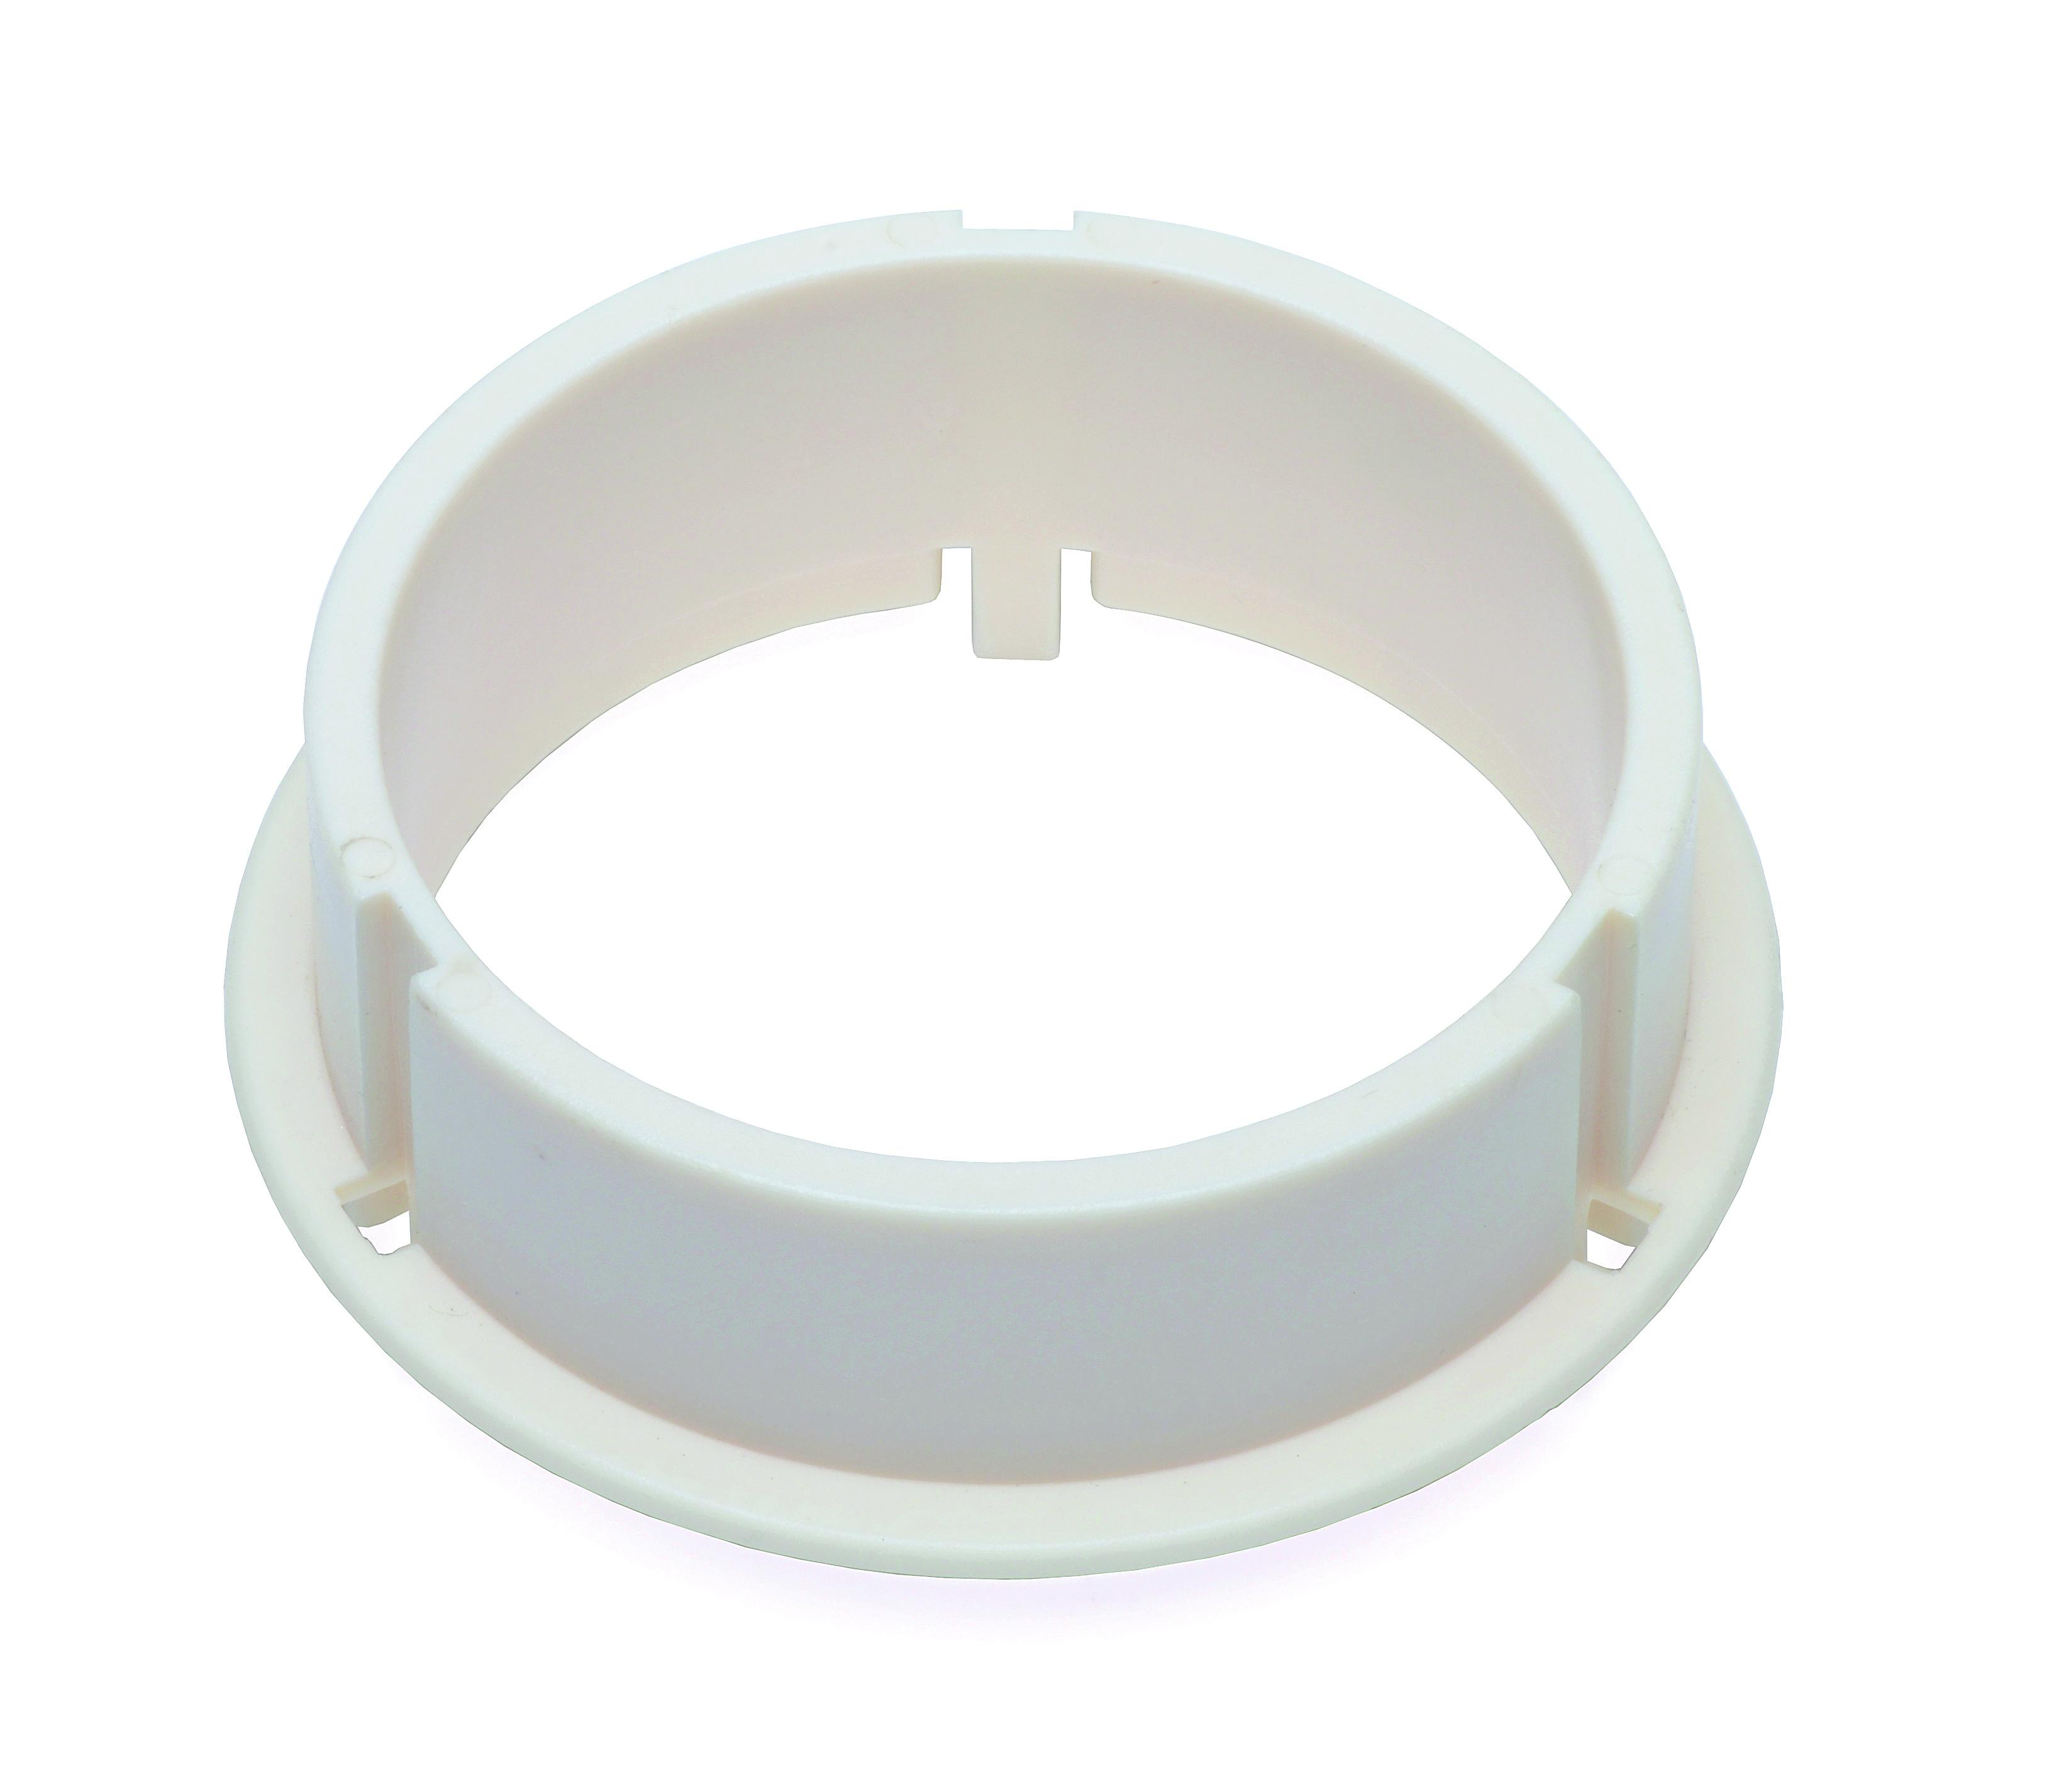 Adapterring 1.1 für LED